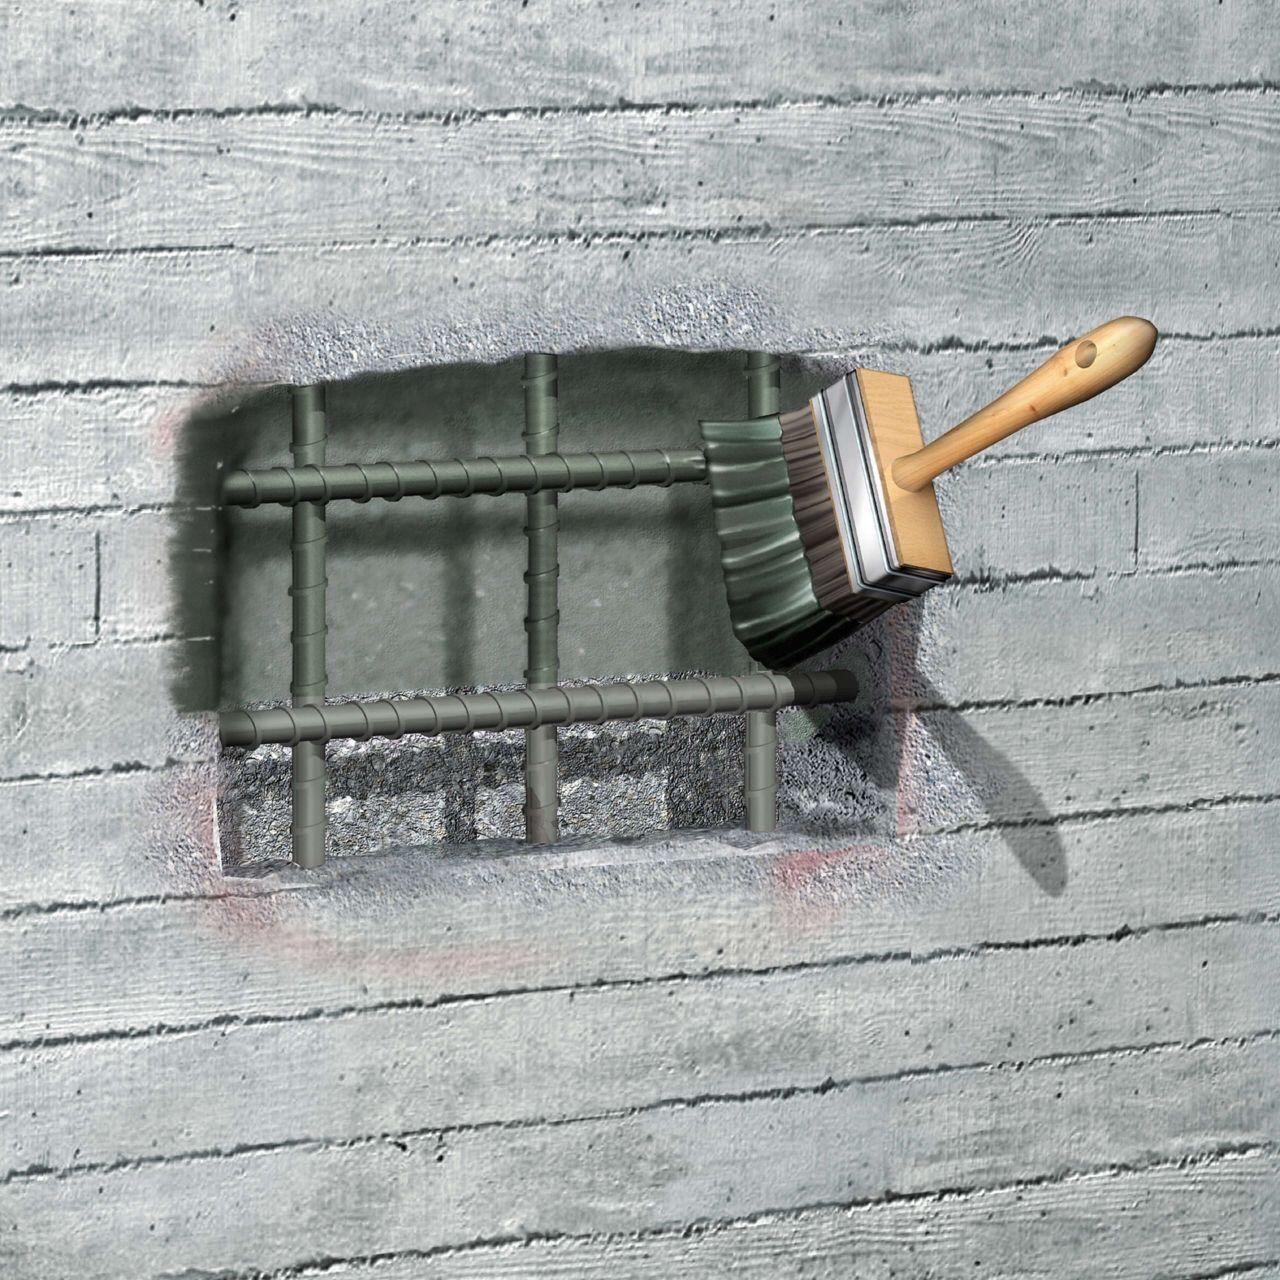 Steel reinforcement drawing